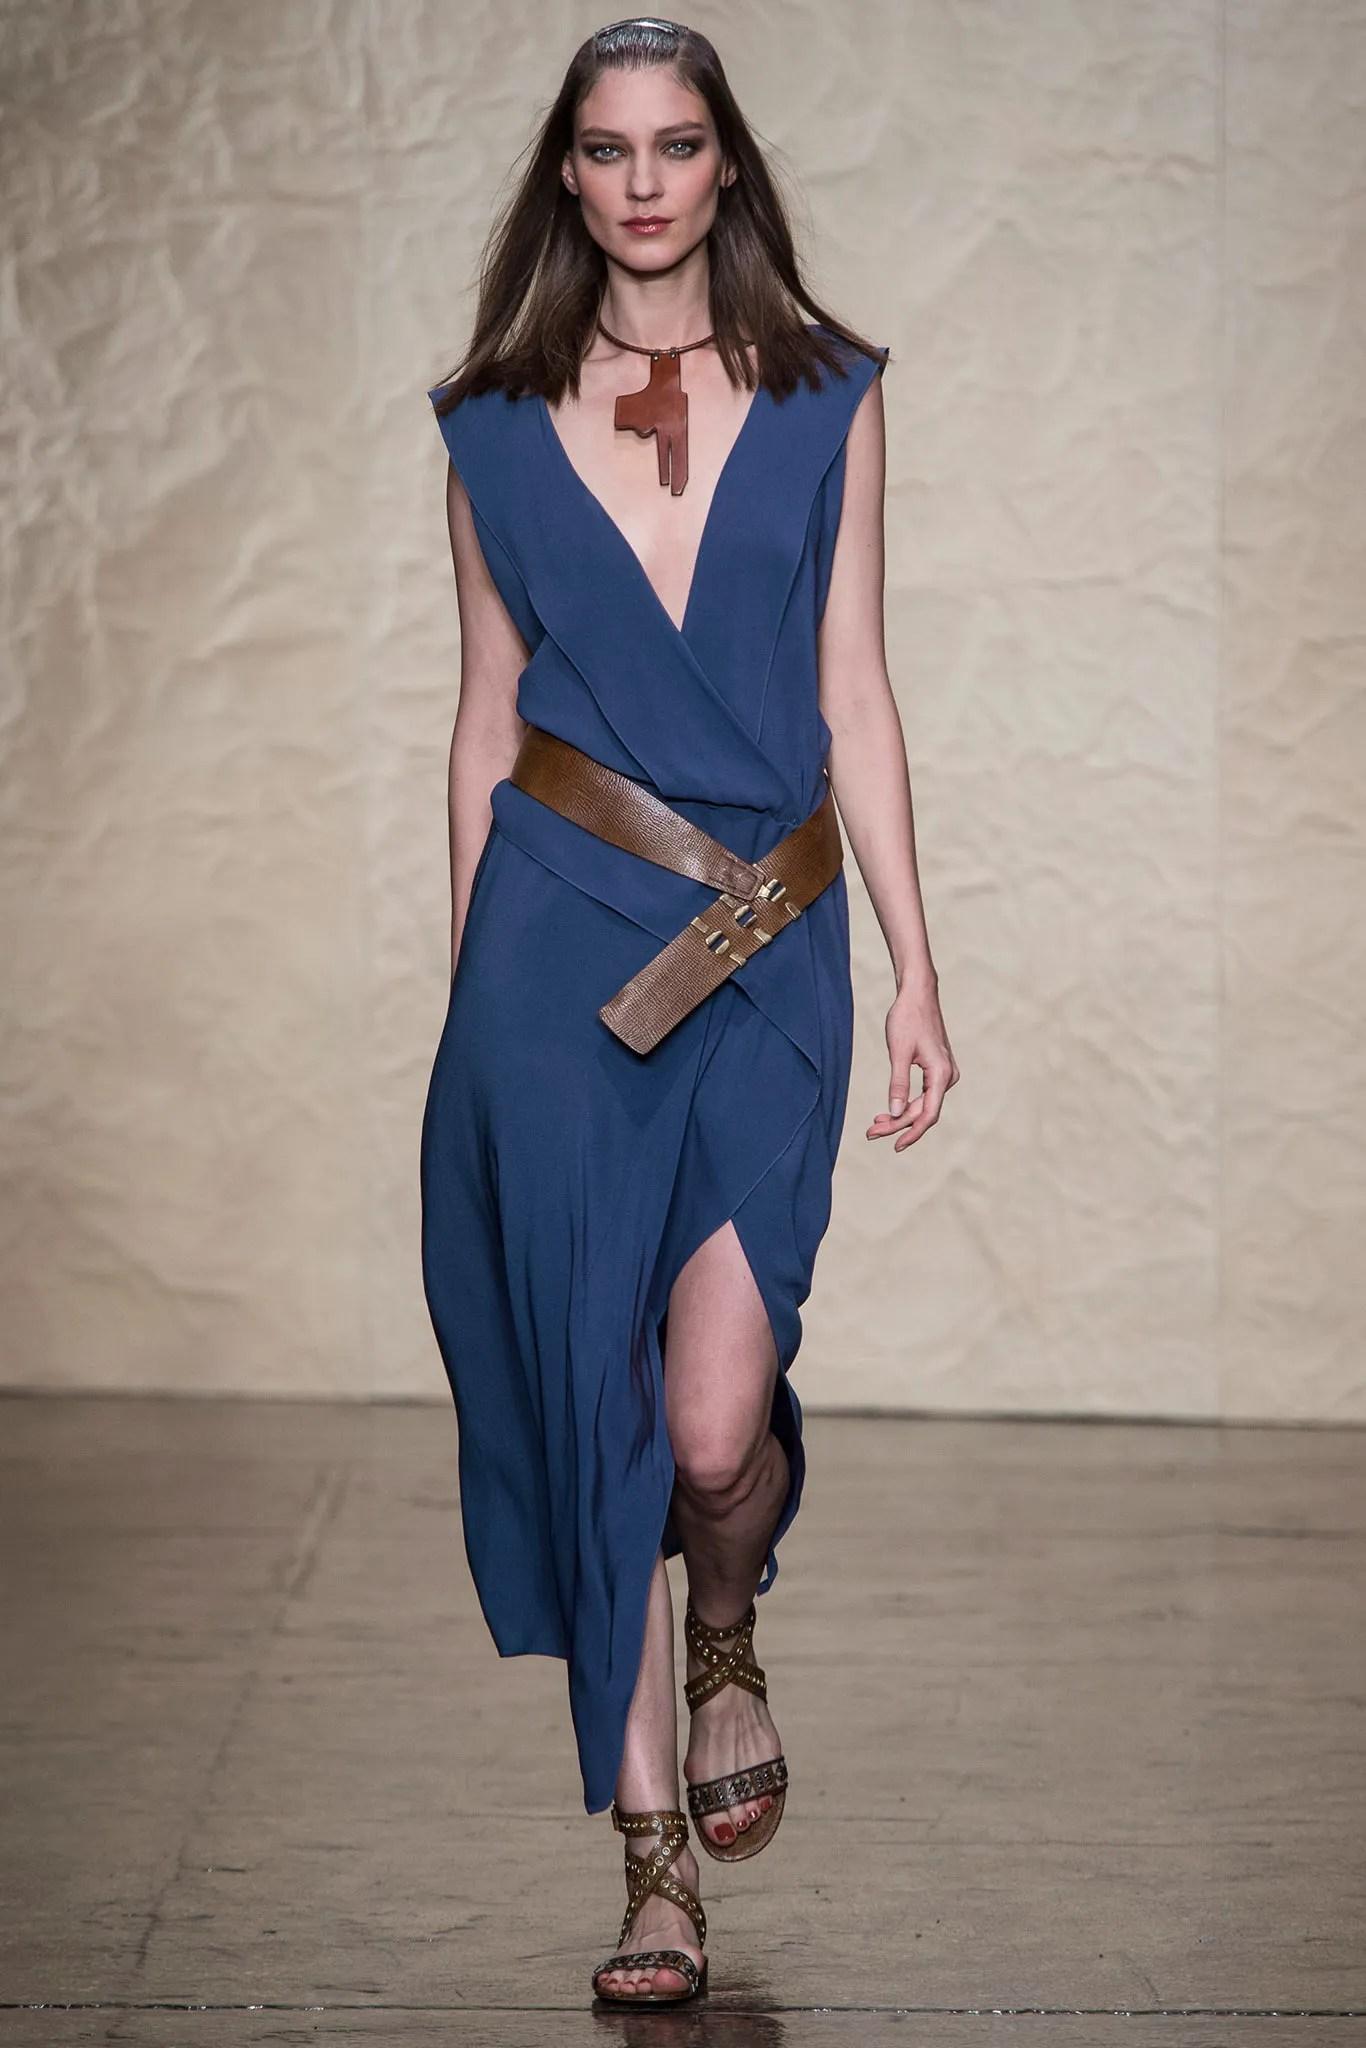 A dress from Donna Karan Spring 2014, the original for Vogue American Designer 1489 (2016)